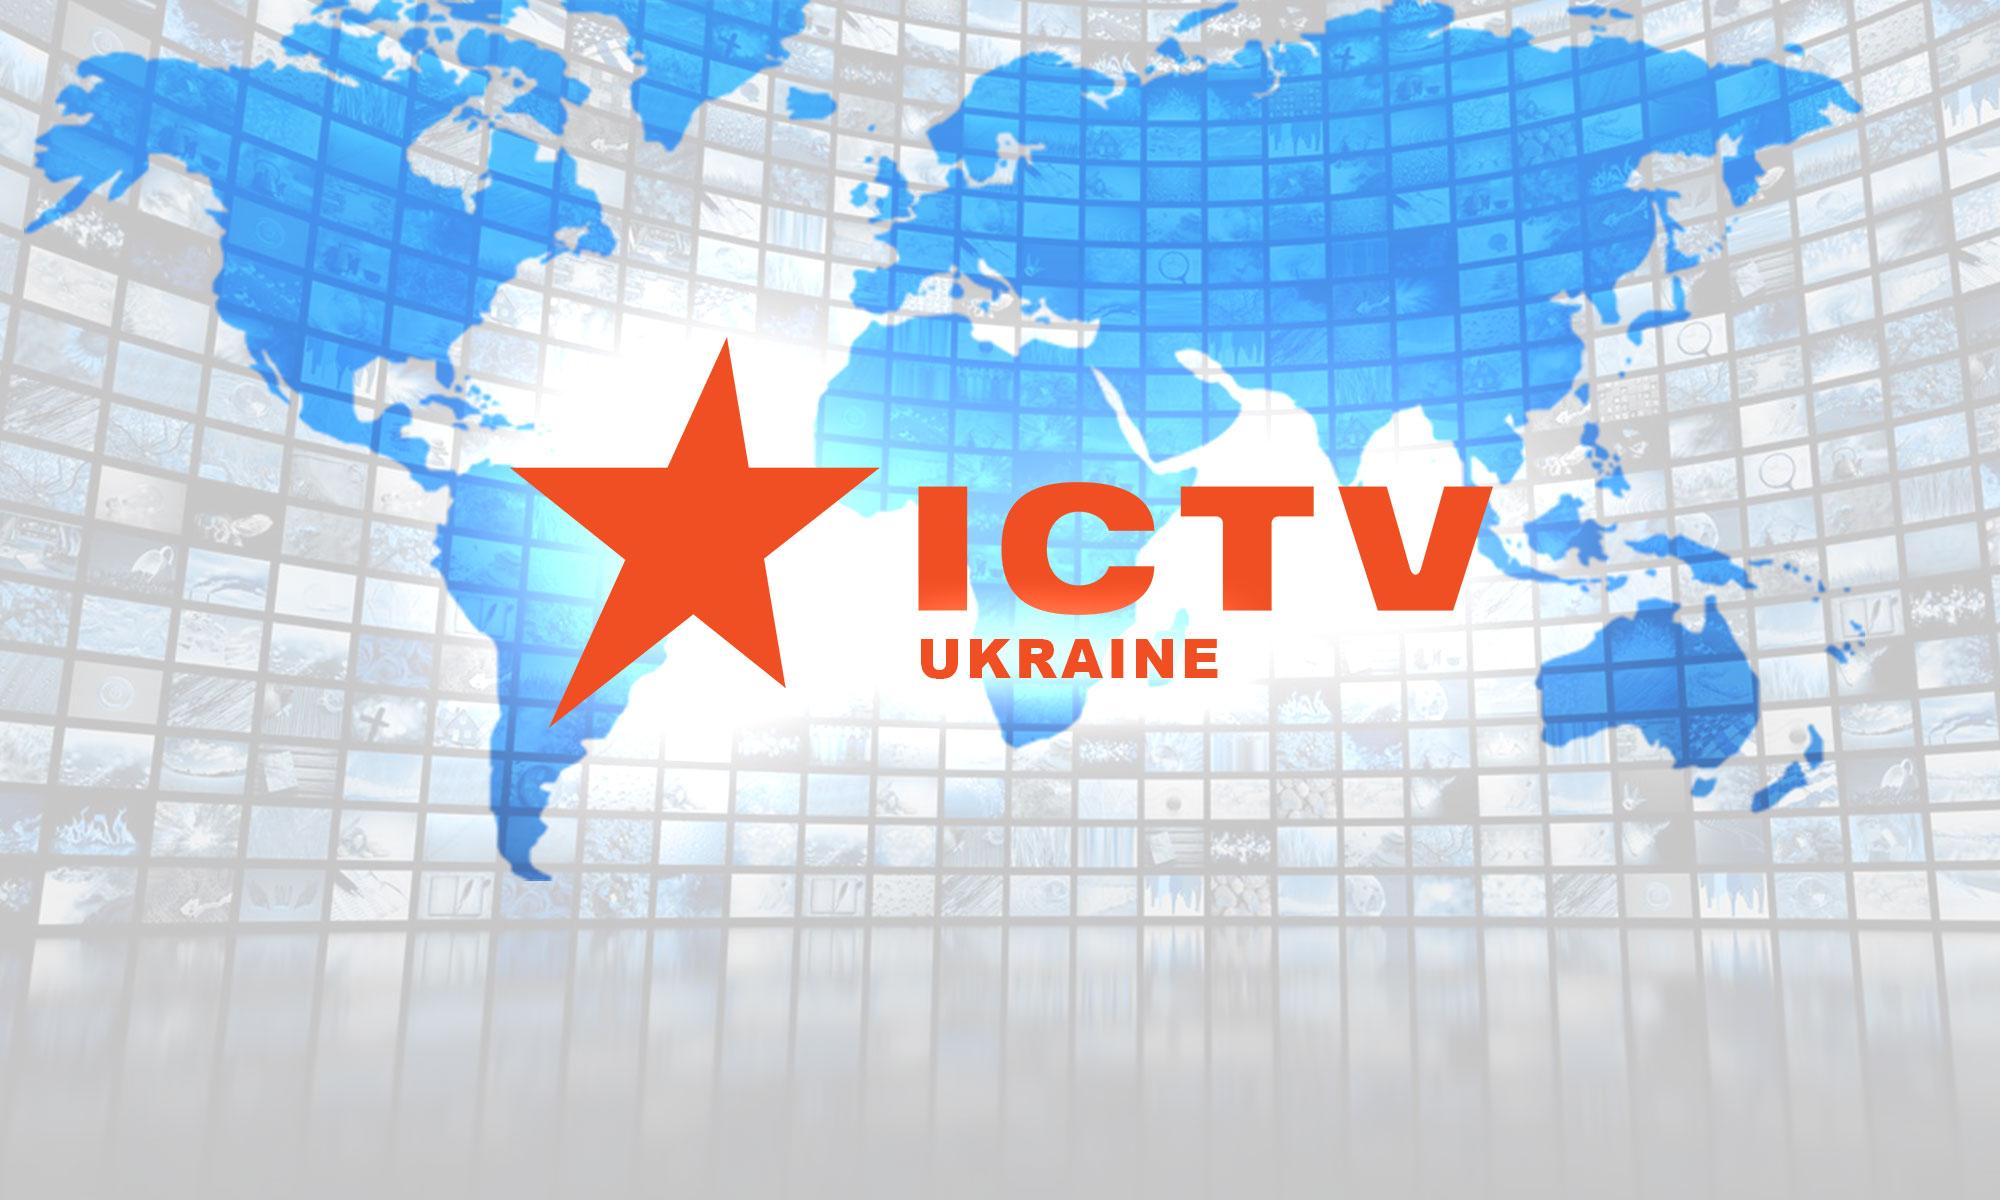 ICTV Ukraine